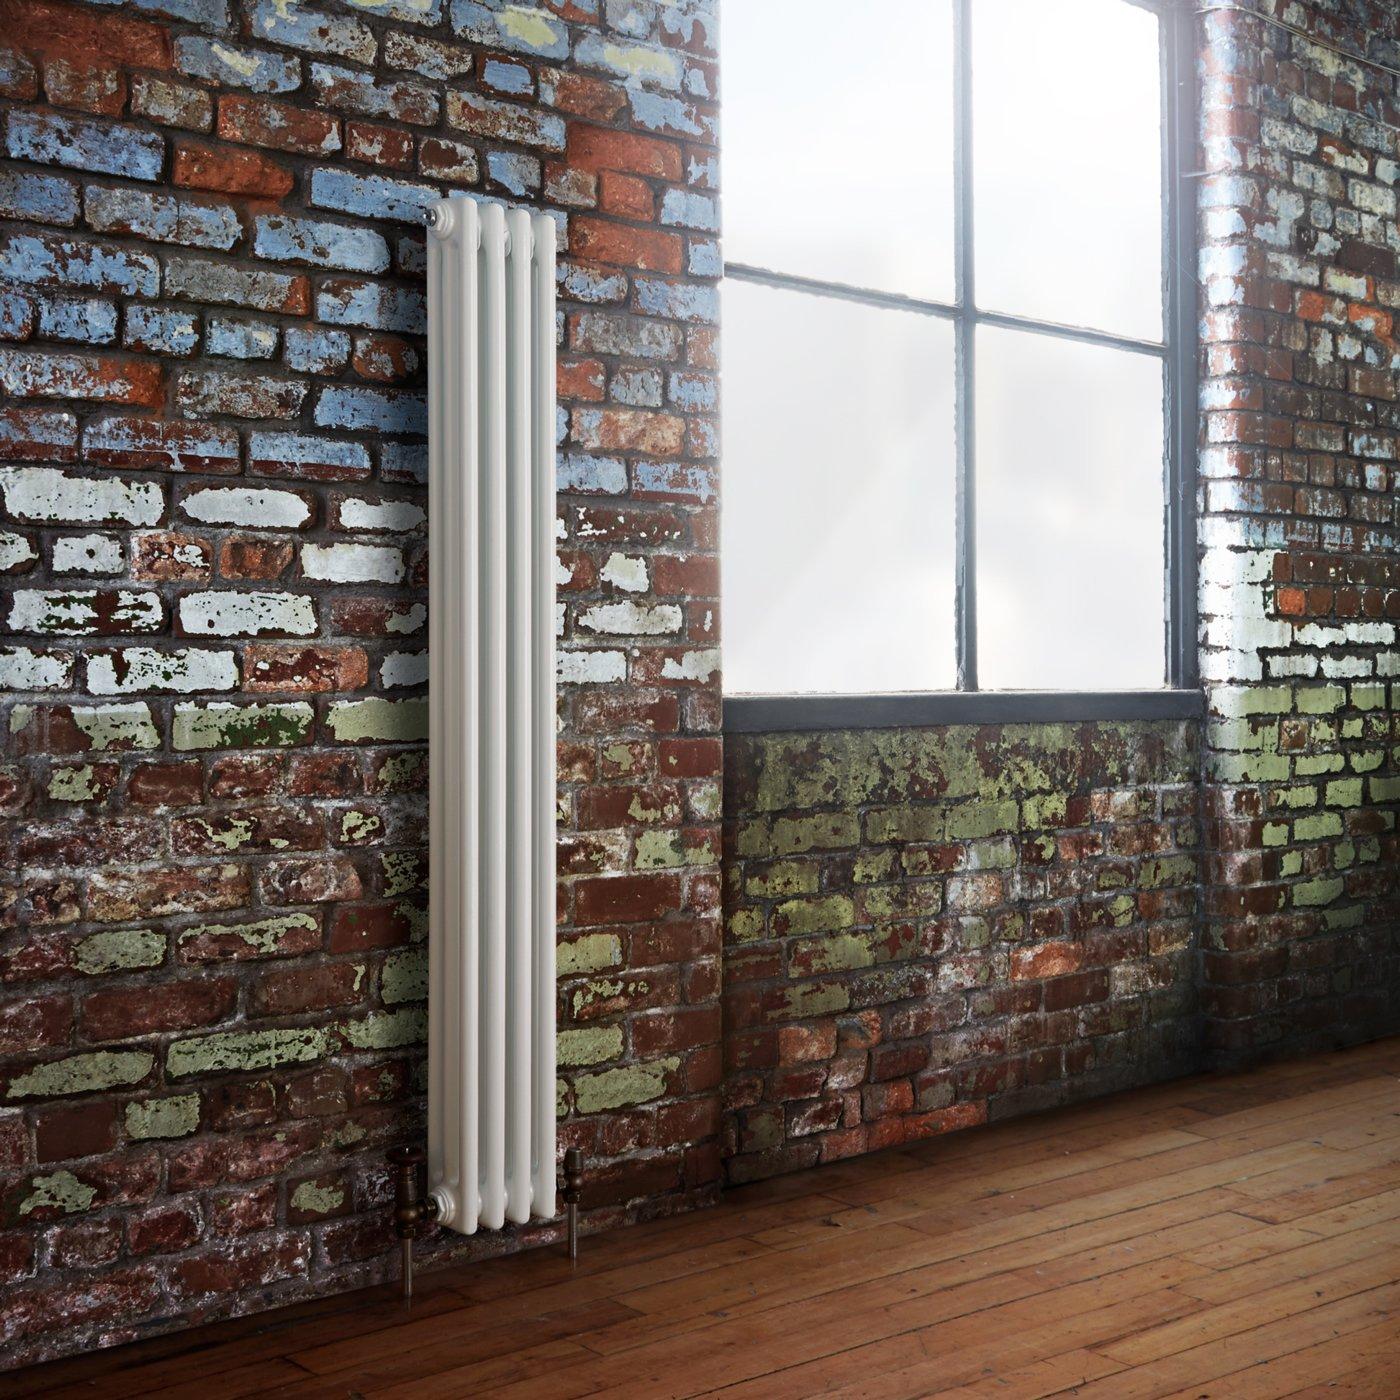 Hudson Reed Radiador Calentador Tradicional Decorativo Diseñ o Vertical Triple - Acero Acabado Blanco - 1500mm x 203mm - 725 Vatios - Calefacció n Central Agua Caliente - Pack Montaje Incluido